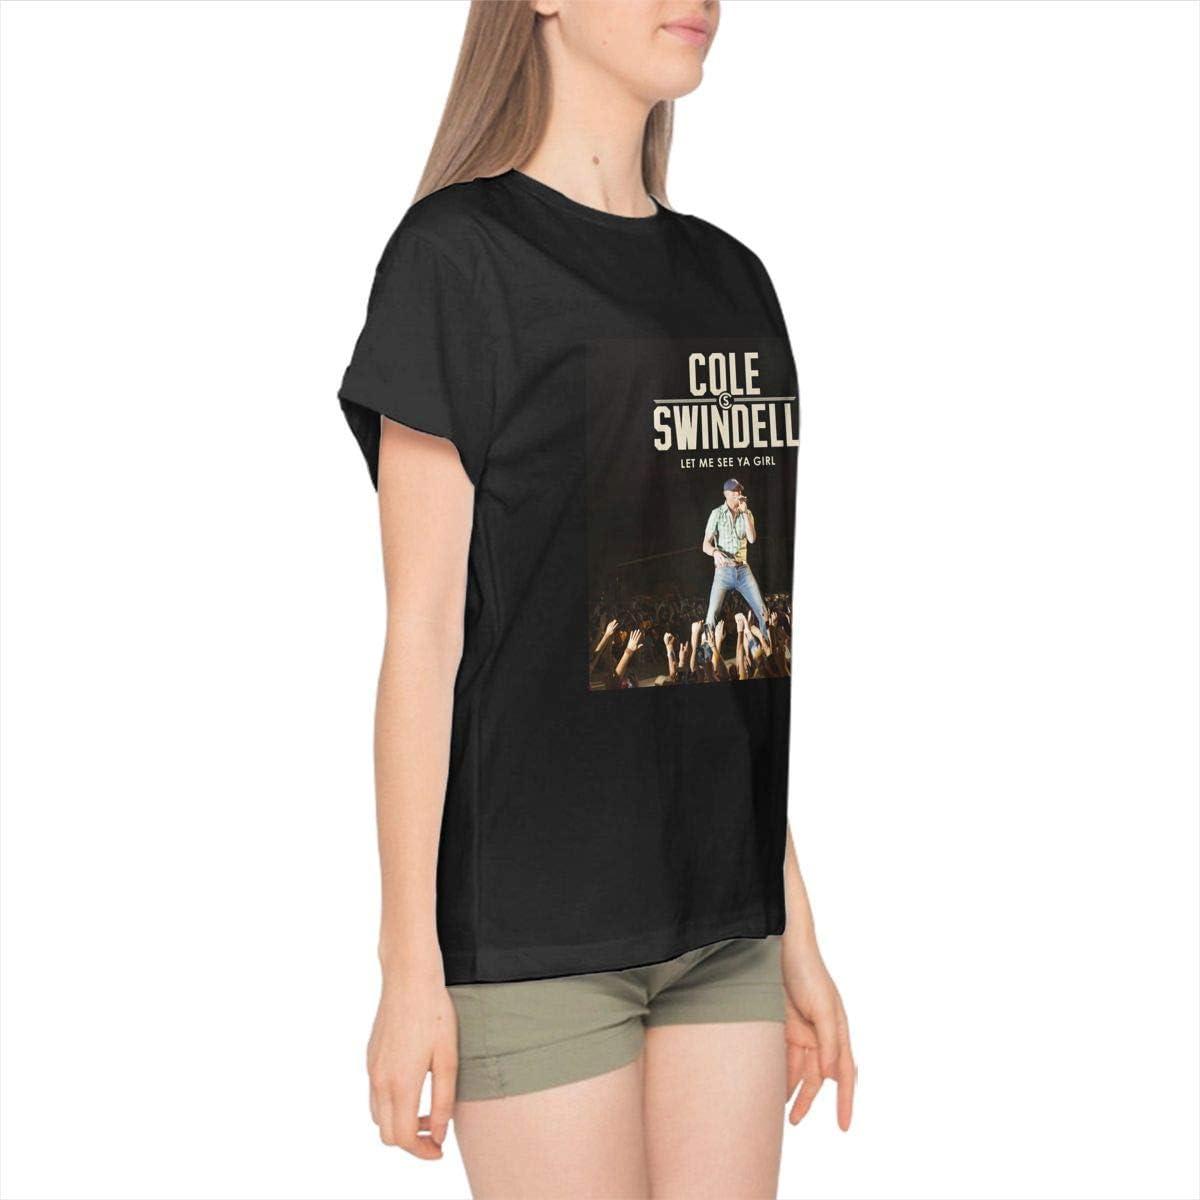 DANIEL BURTON Black Cole Swindell T-Shirt Summer Breathable for Womens